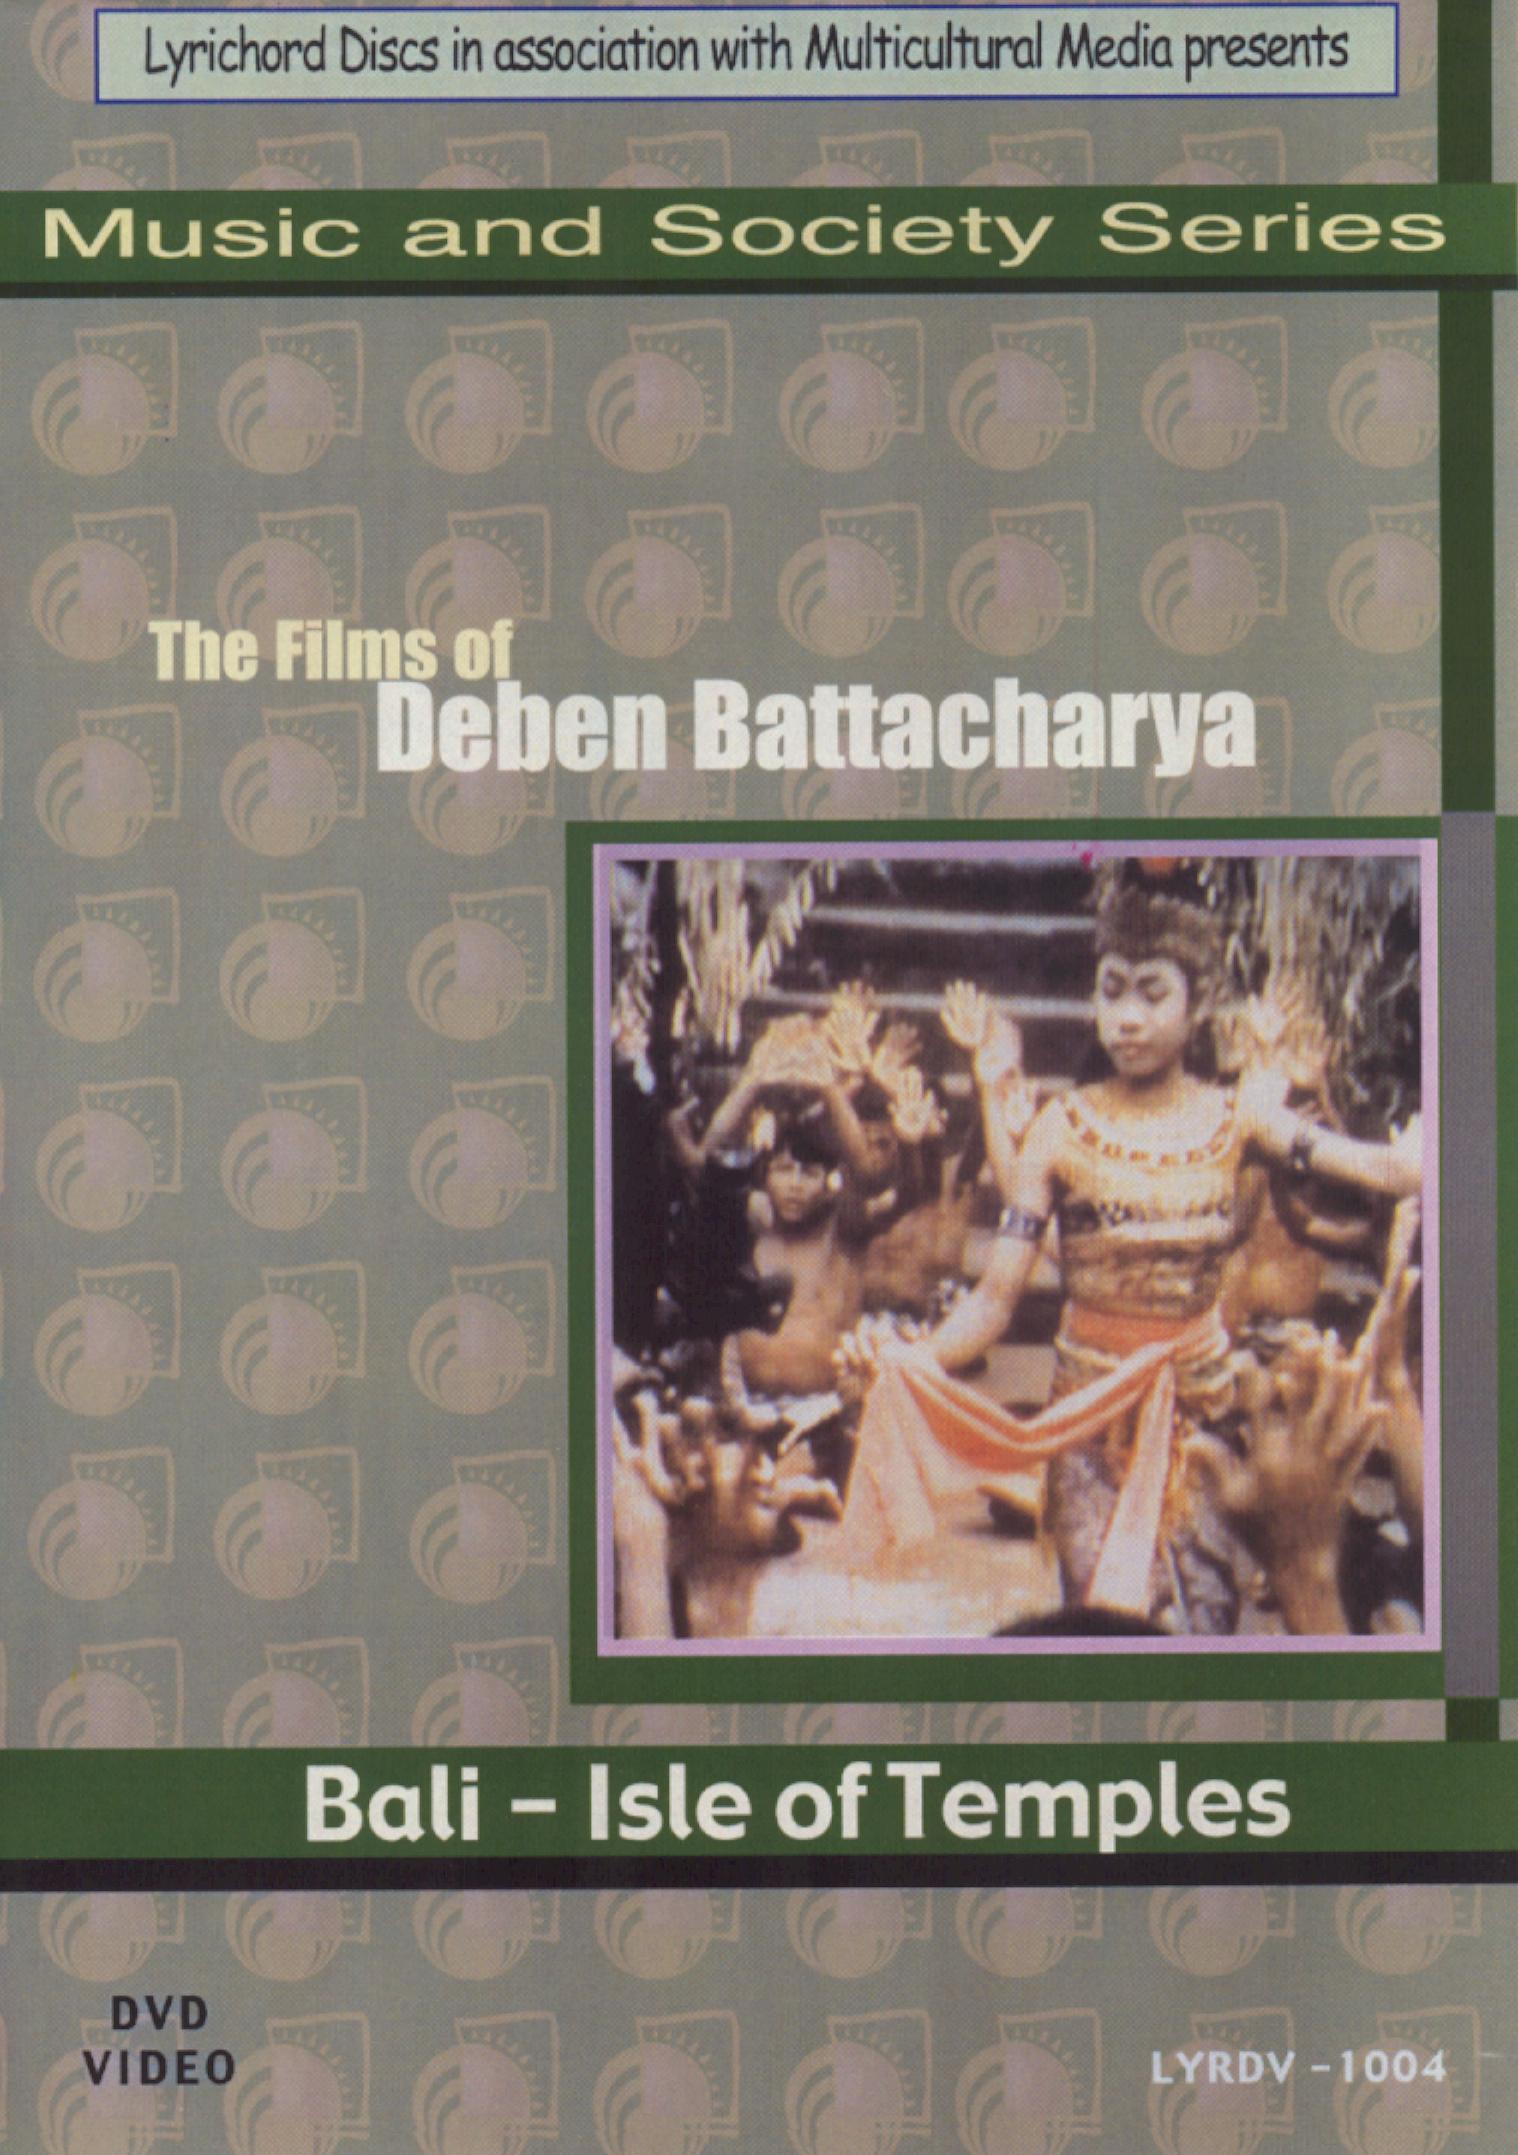 Bali: Isles of Temples